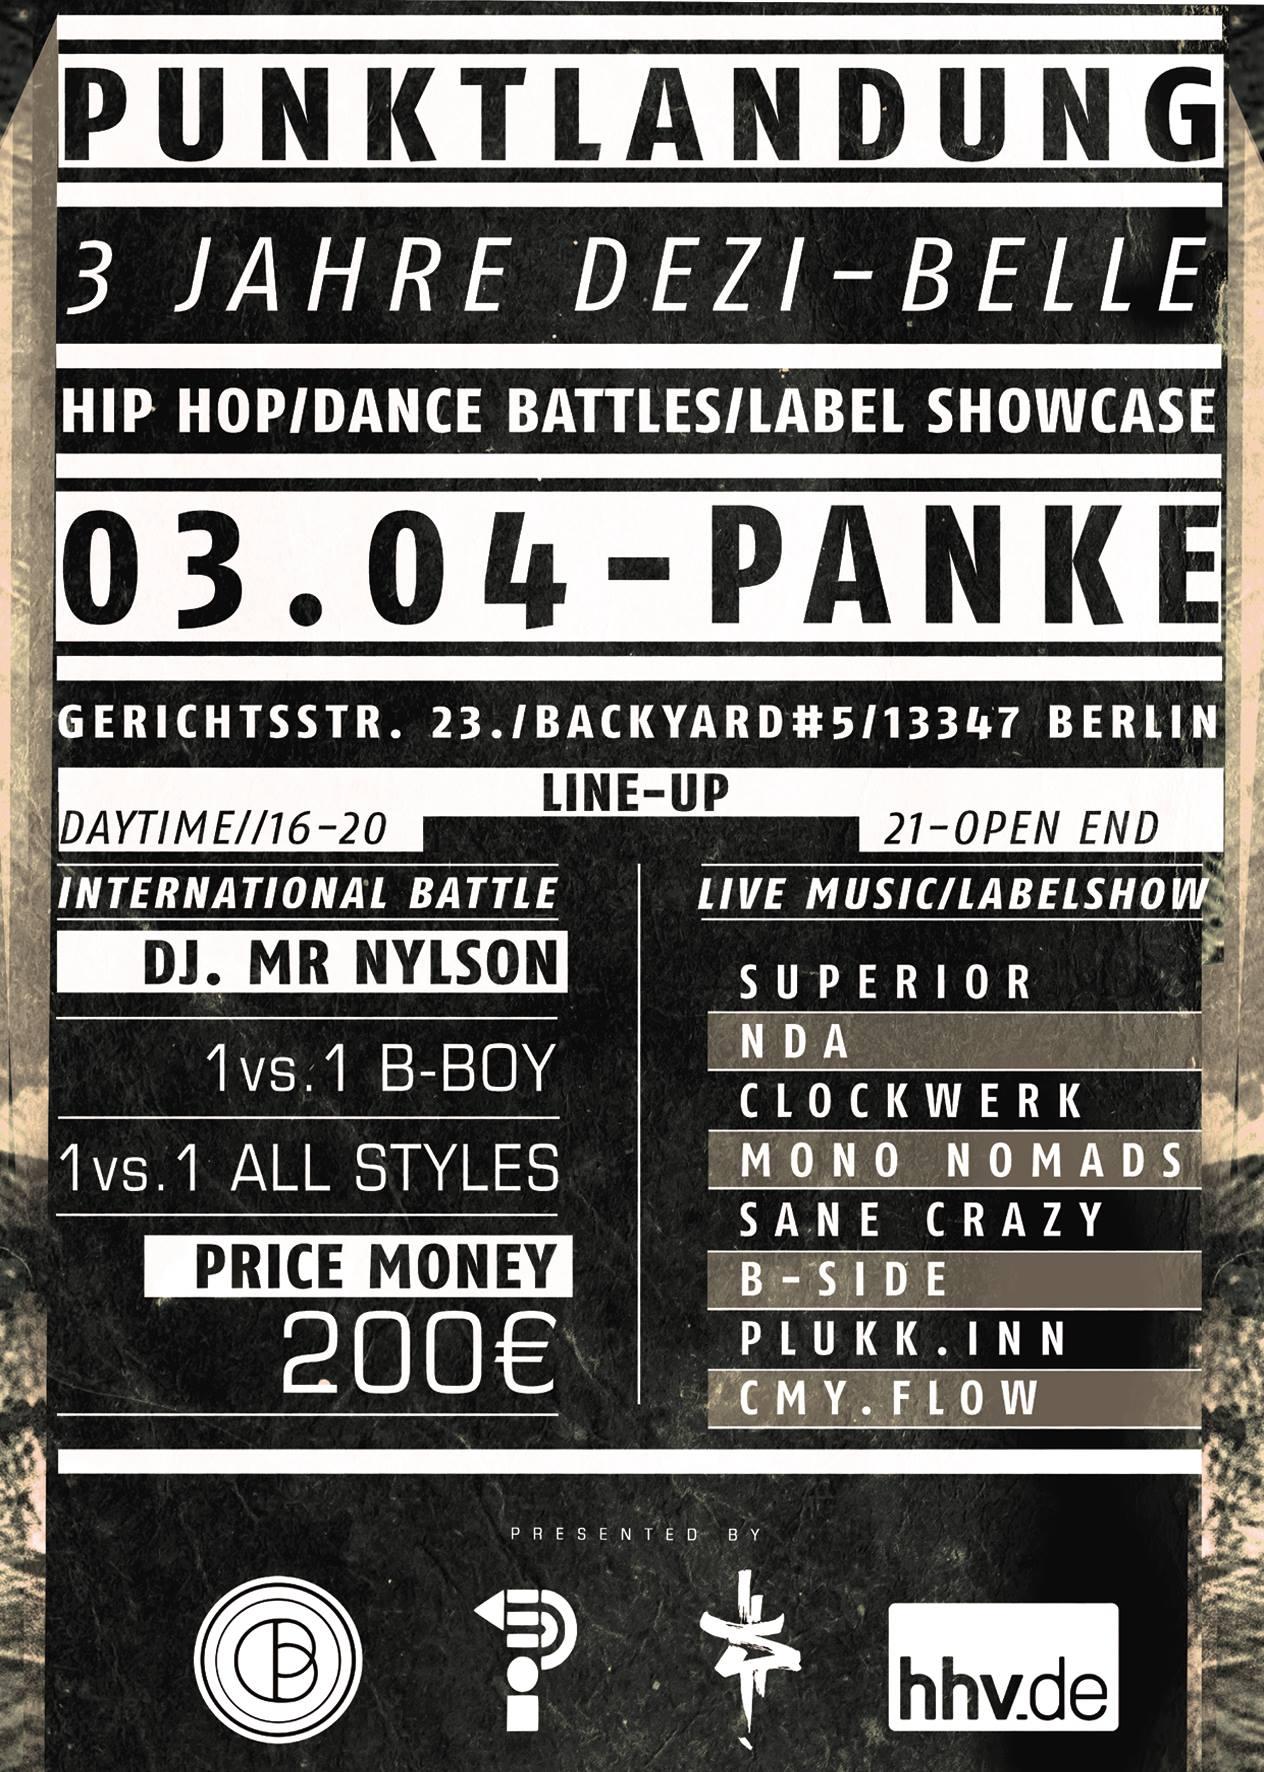 Punktlandung: 3 Jahre Dezi-Belle Records